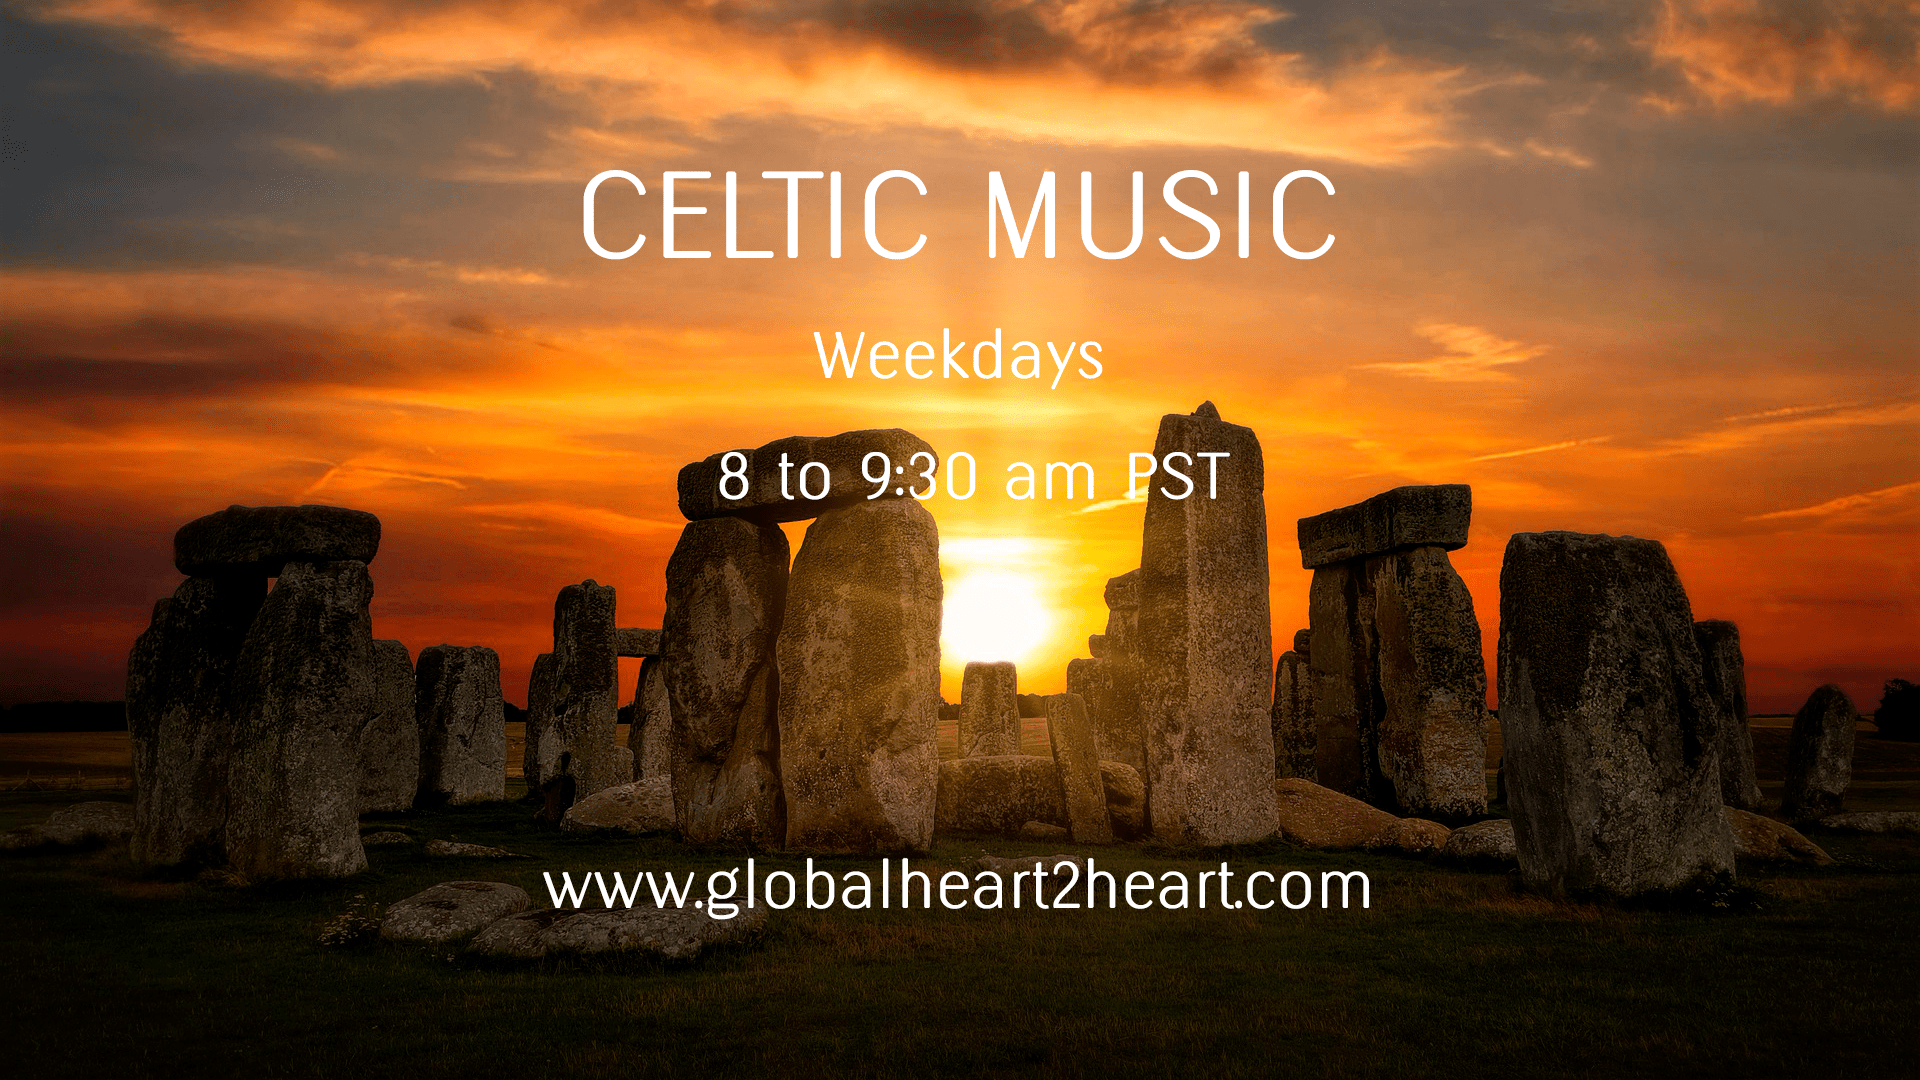 Celtic Music Weekdays on Global Heart 2 Heart Radio